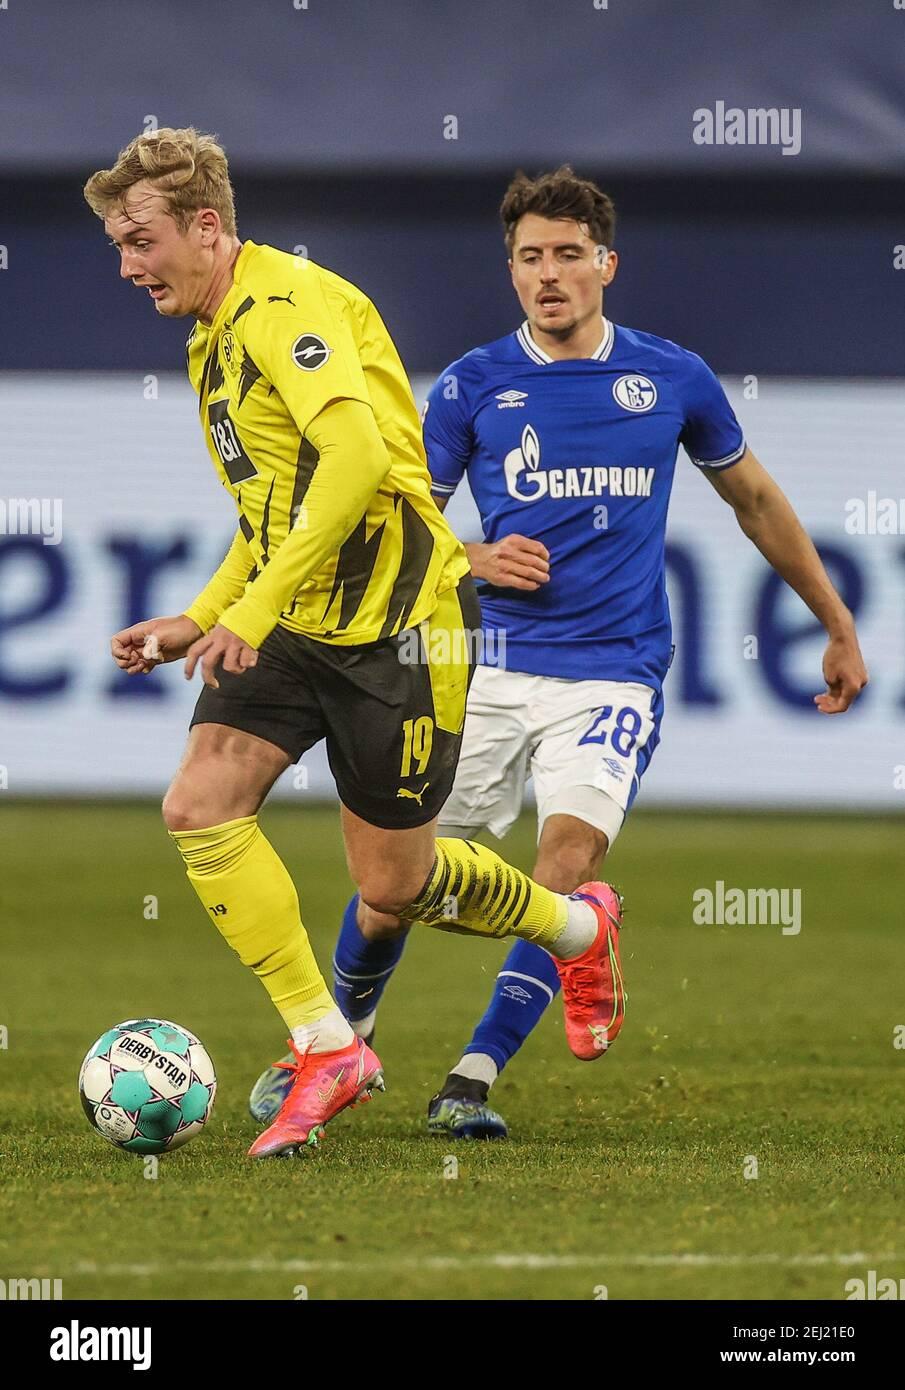 Alessandro Schoepf Fc Schalke 04 High Resolution Stock Photography ...